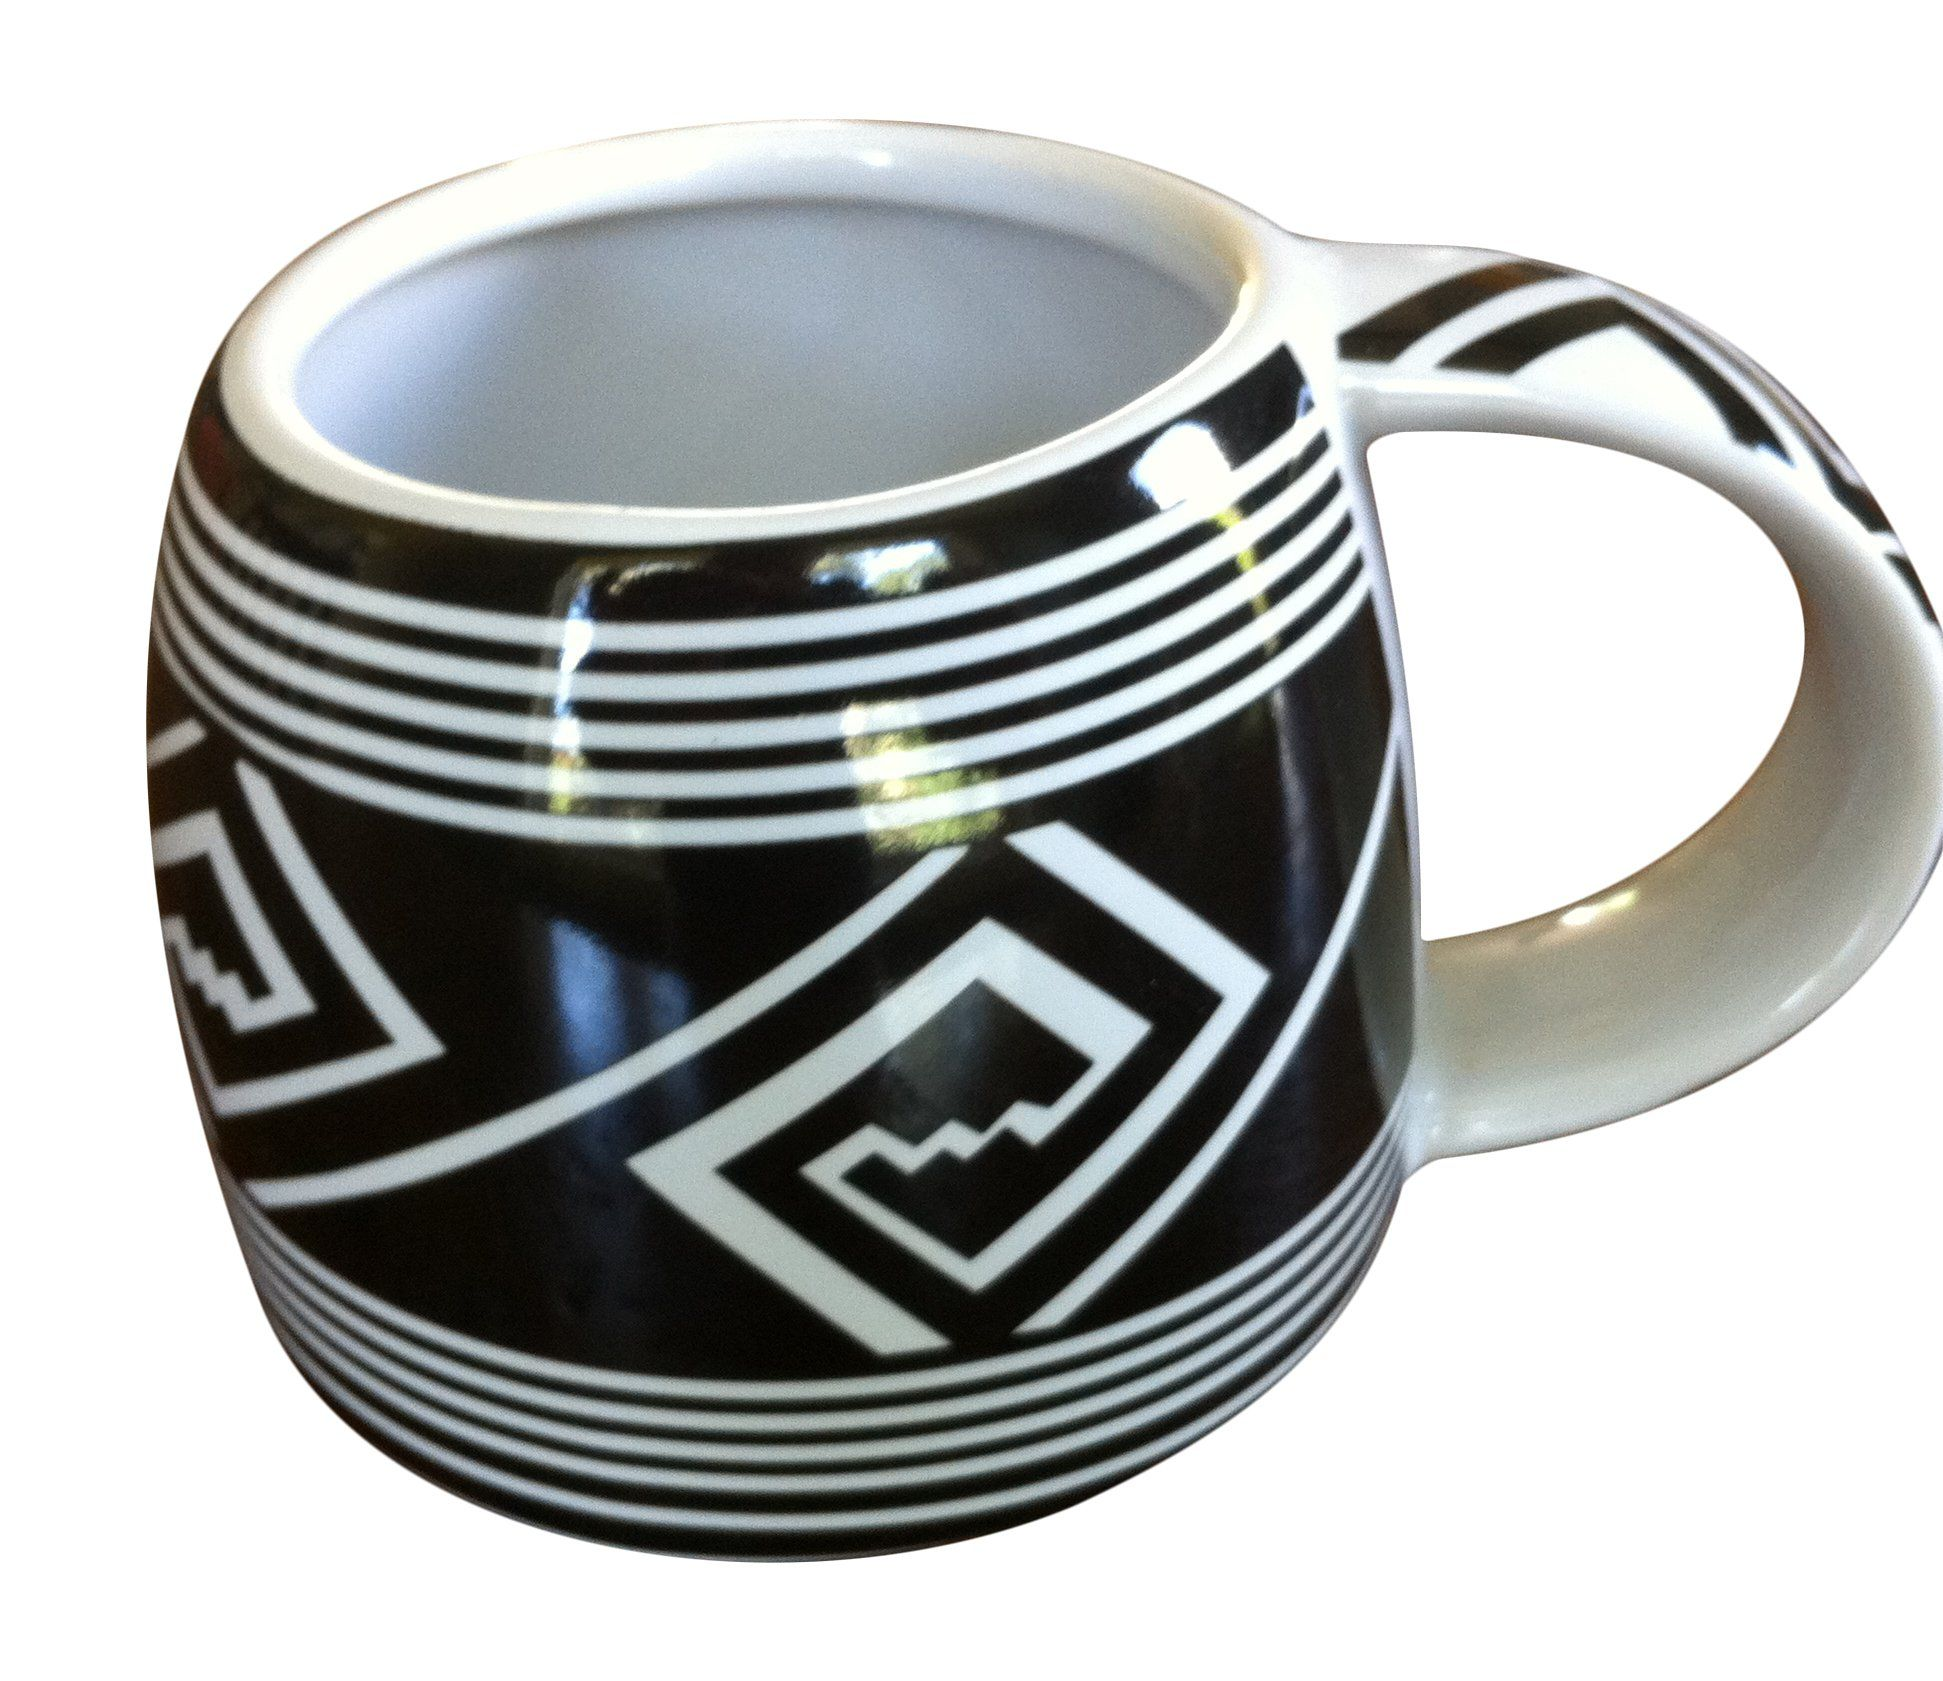 Distinctive 8 oz.Ceramic Mug With Ancient